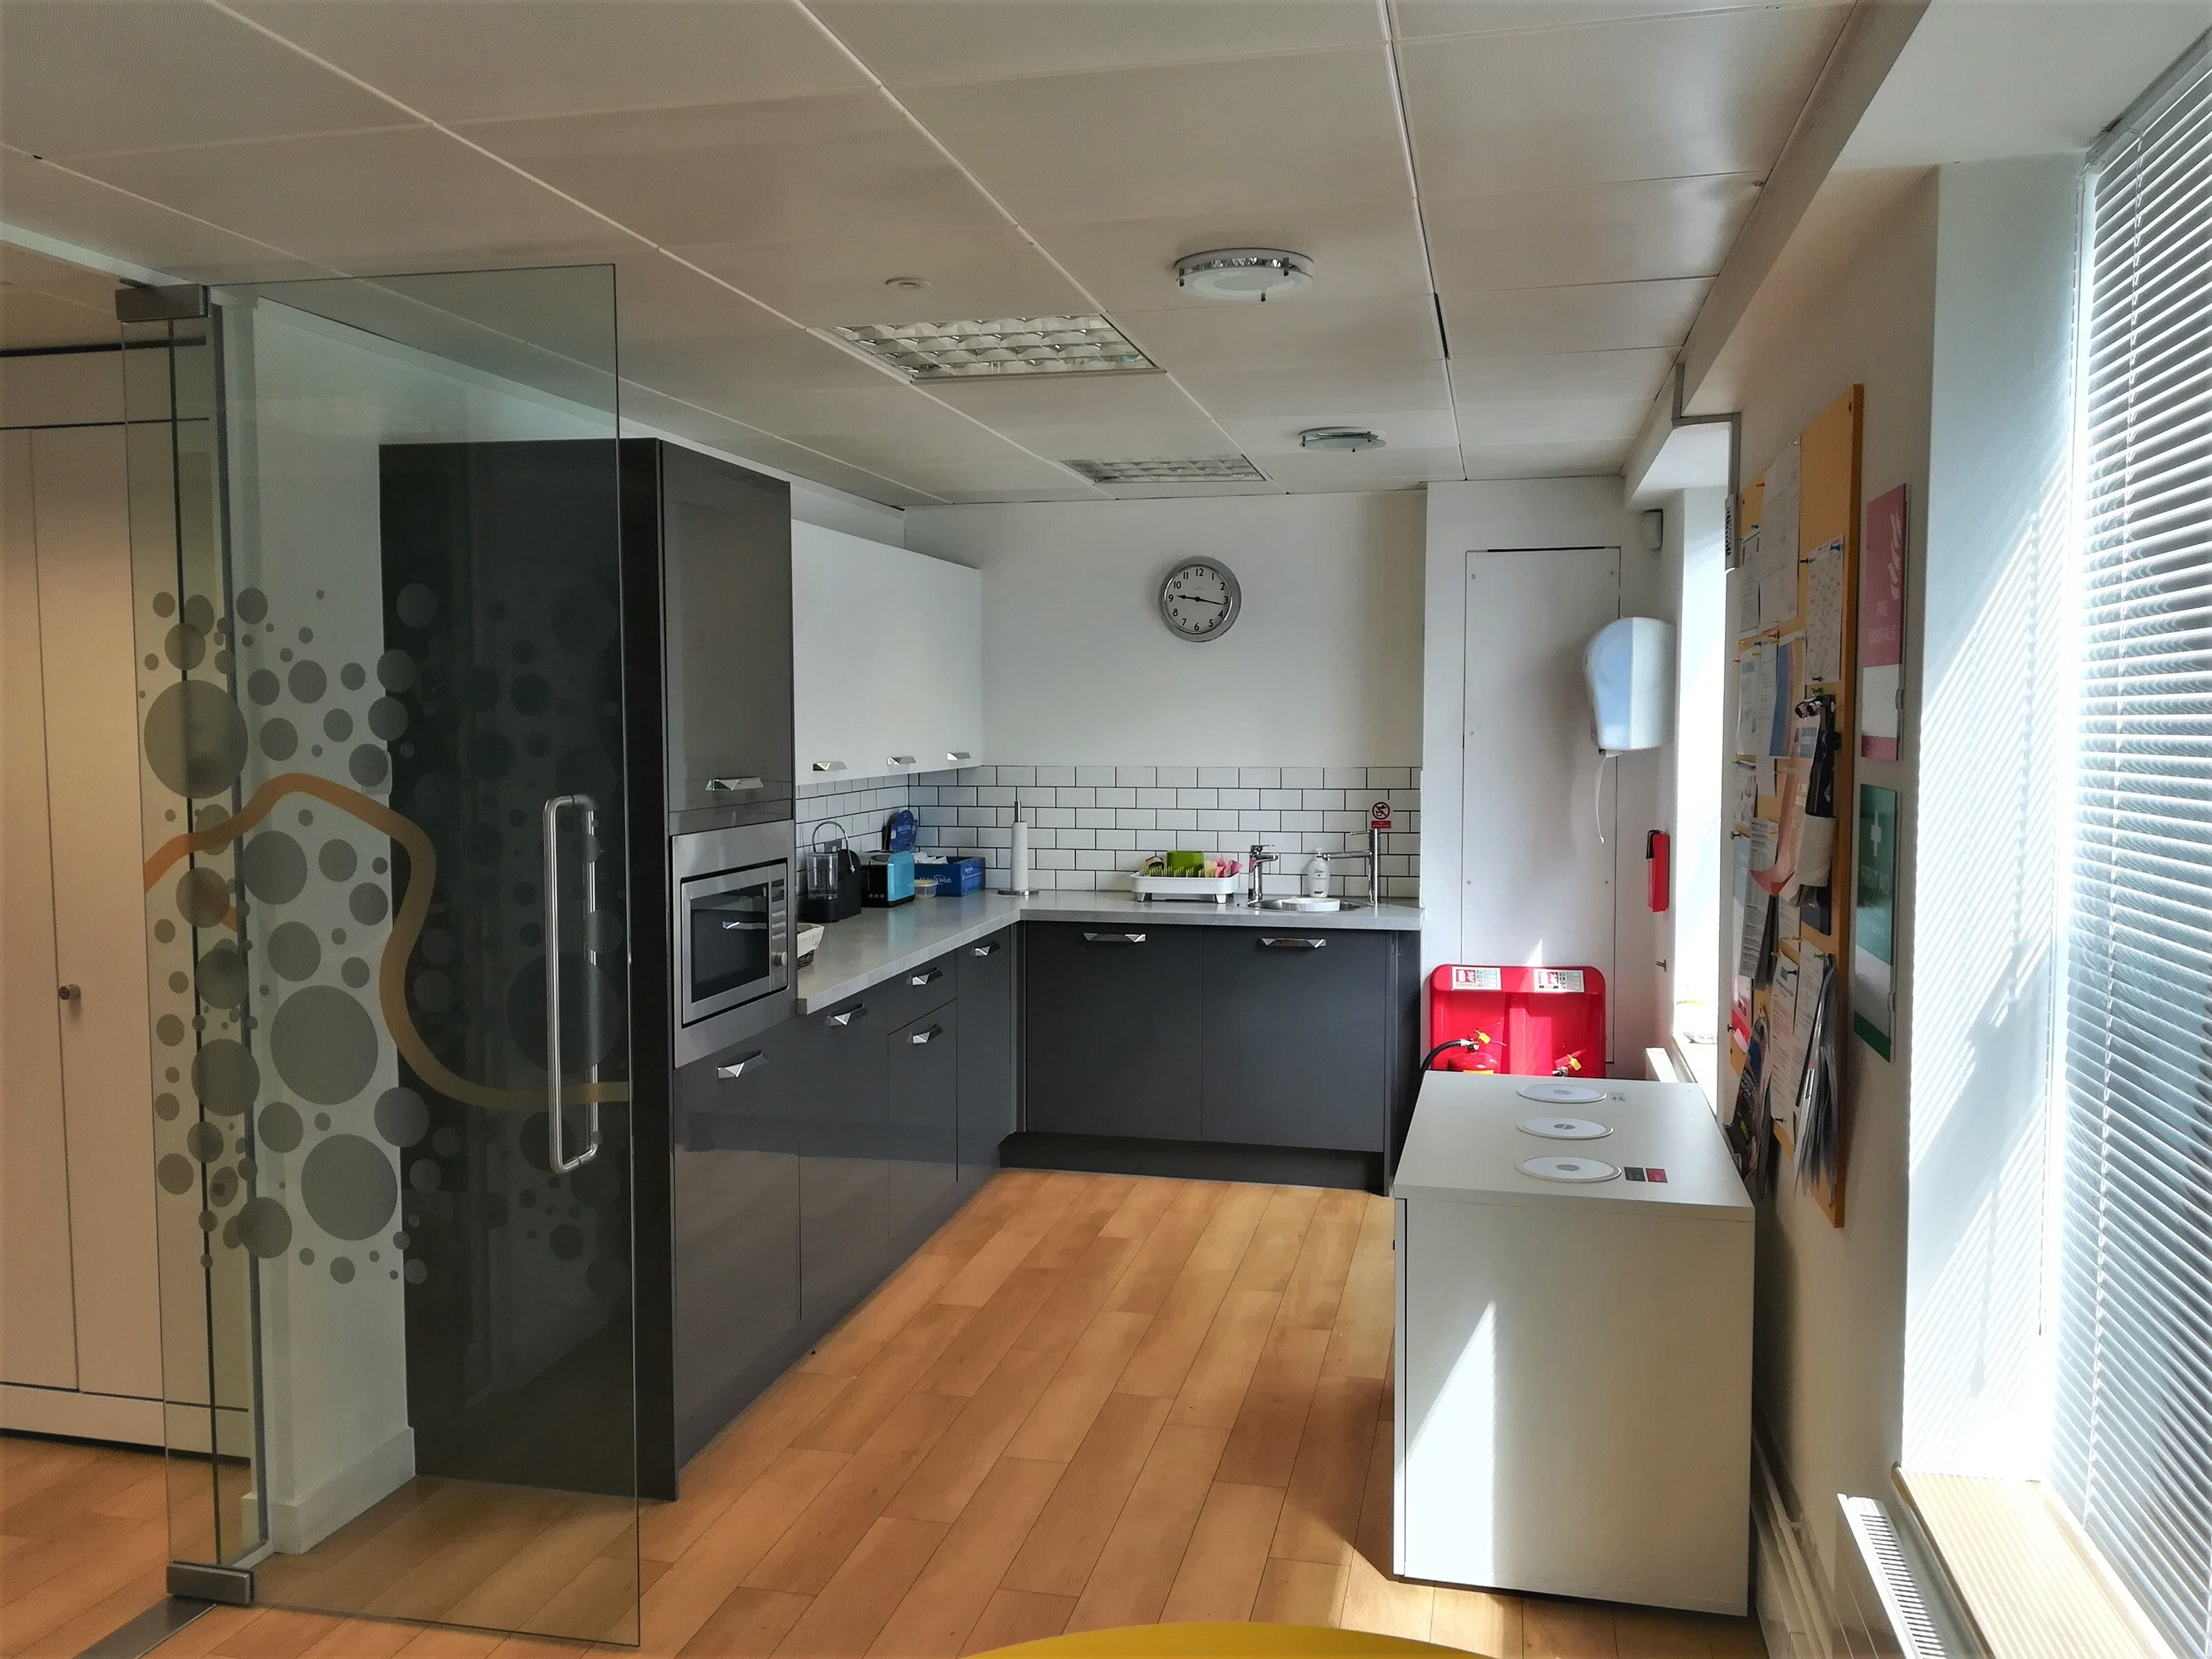 Second Floor, Regatta House, Marlow, Offices To Let - Kitchen.jpg